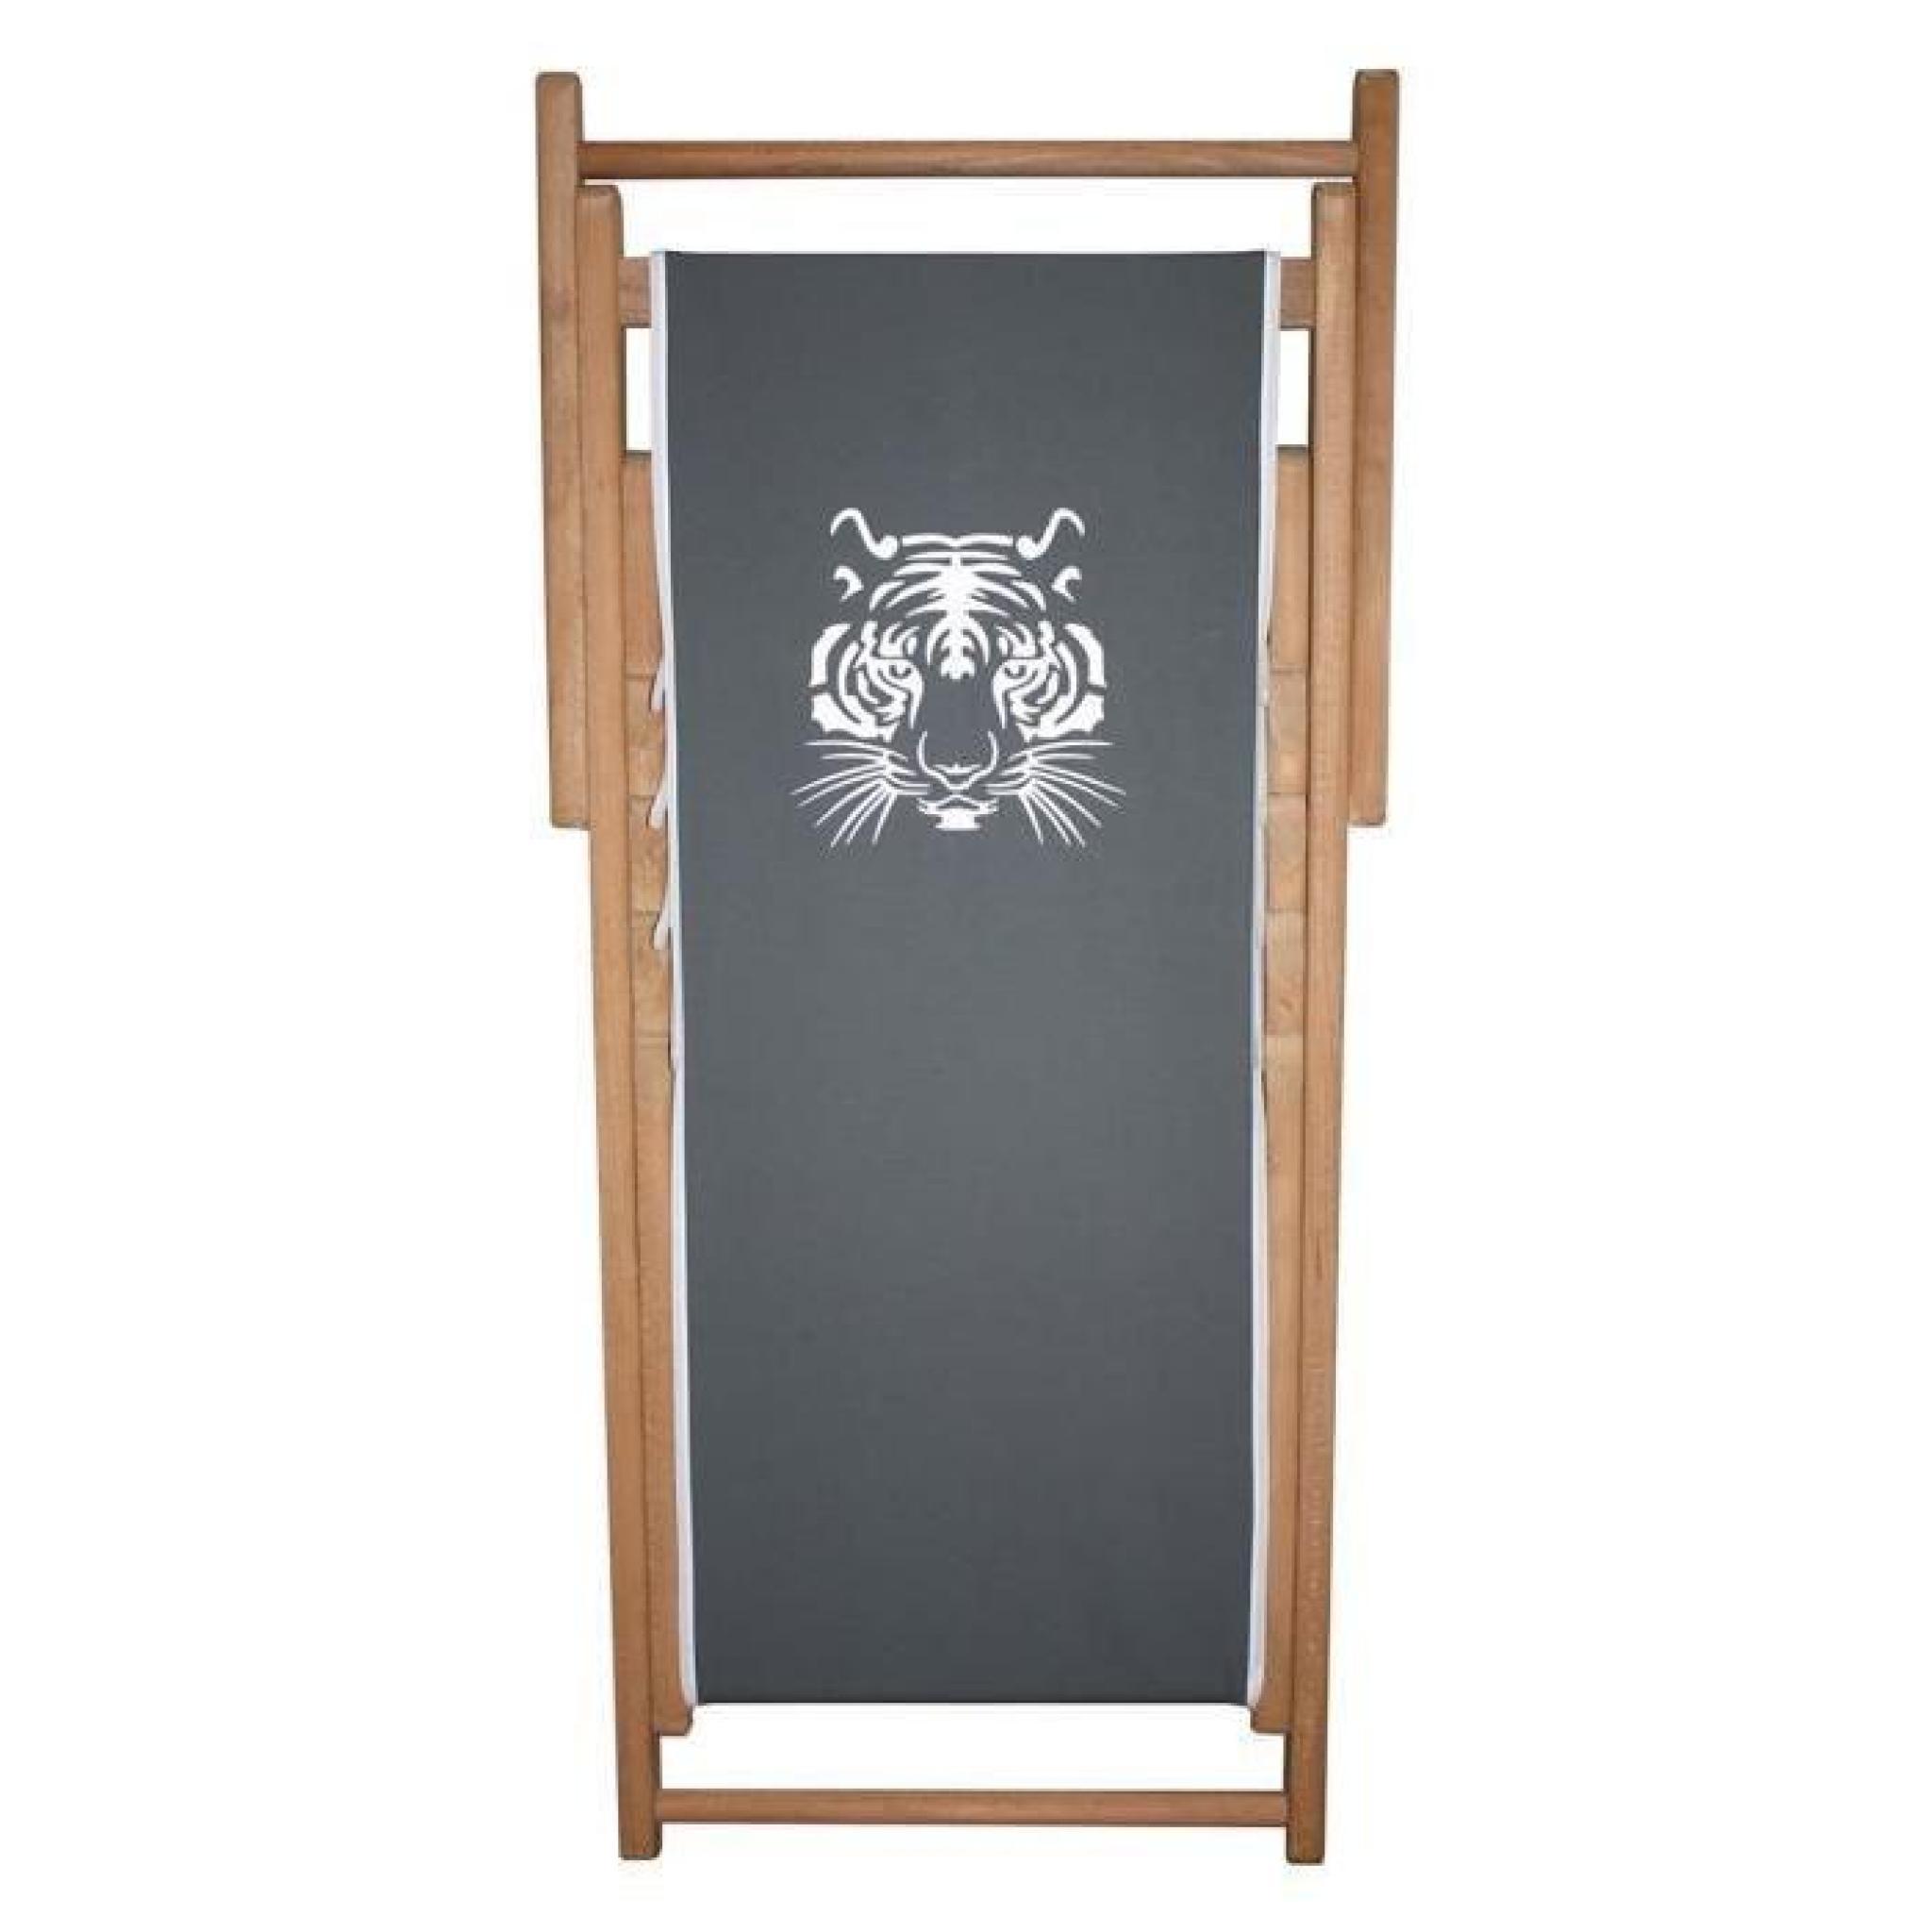 transat enfant en bois et toile coton gris anthracite. Black Bedroom Furniture Sets. Home Design Ideas